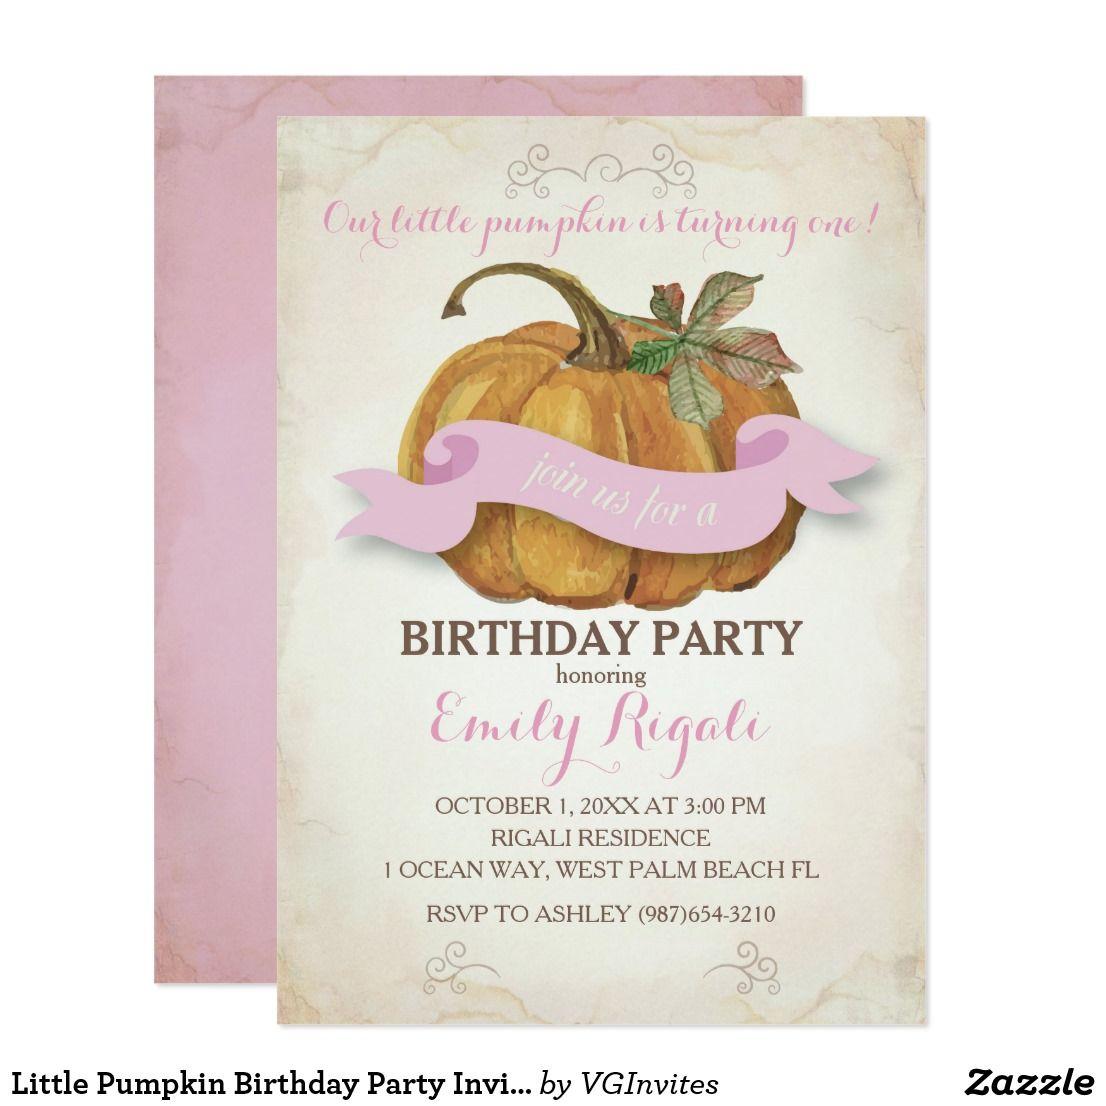 Little Pumpkin Birthday Party Invitation - Girl   Pumpkin birthday ...